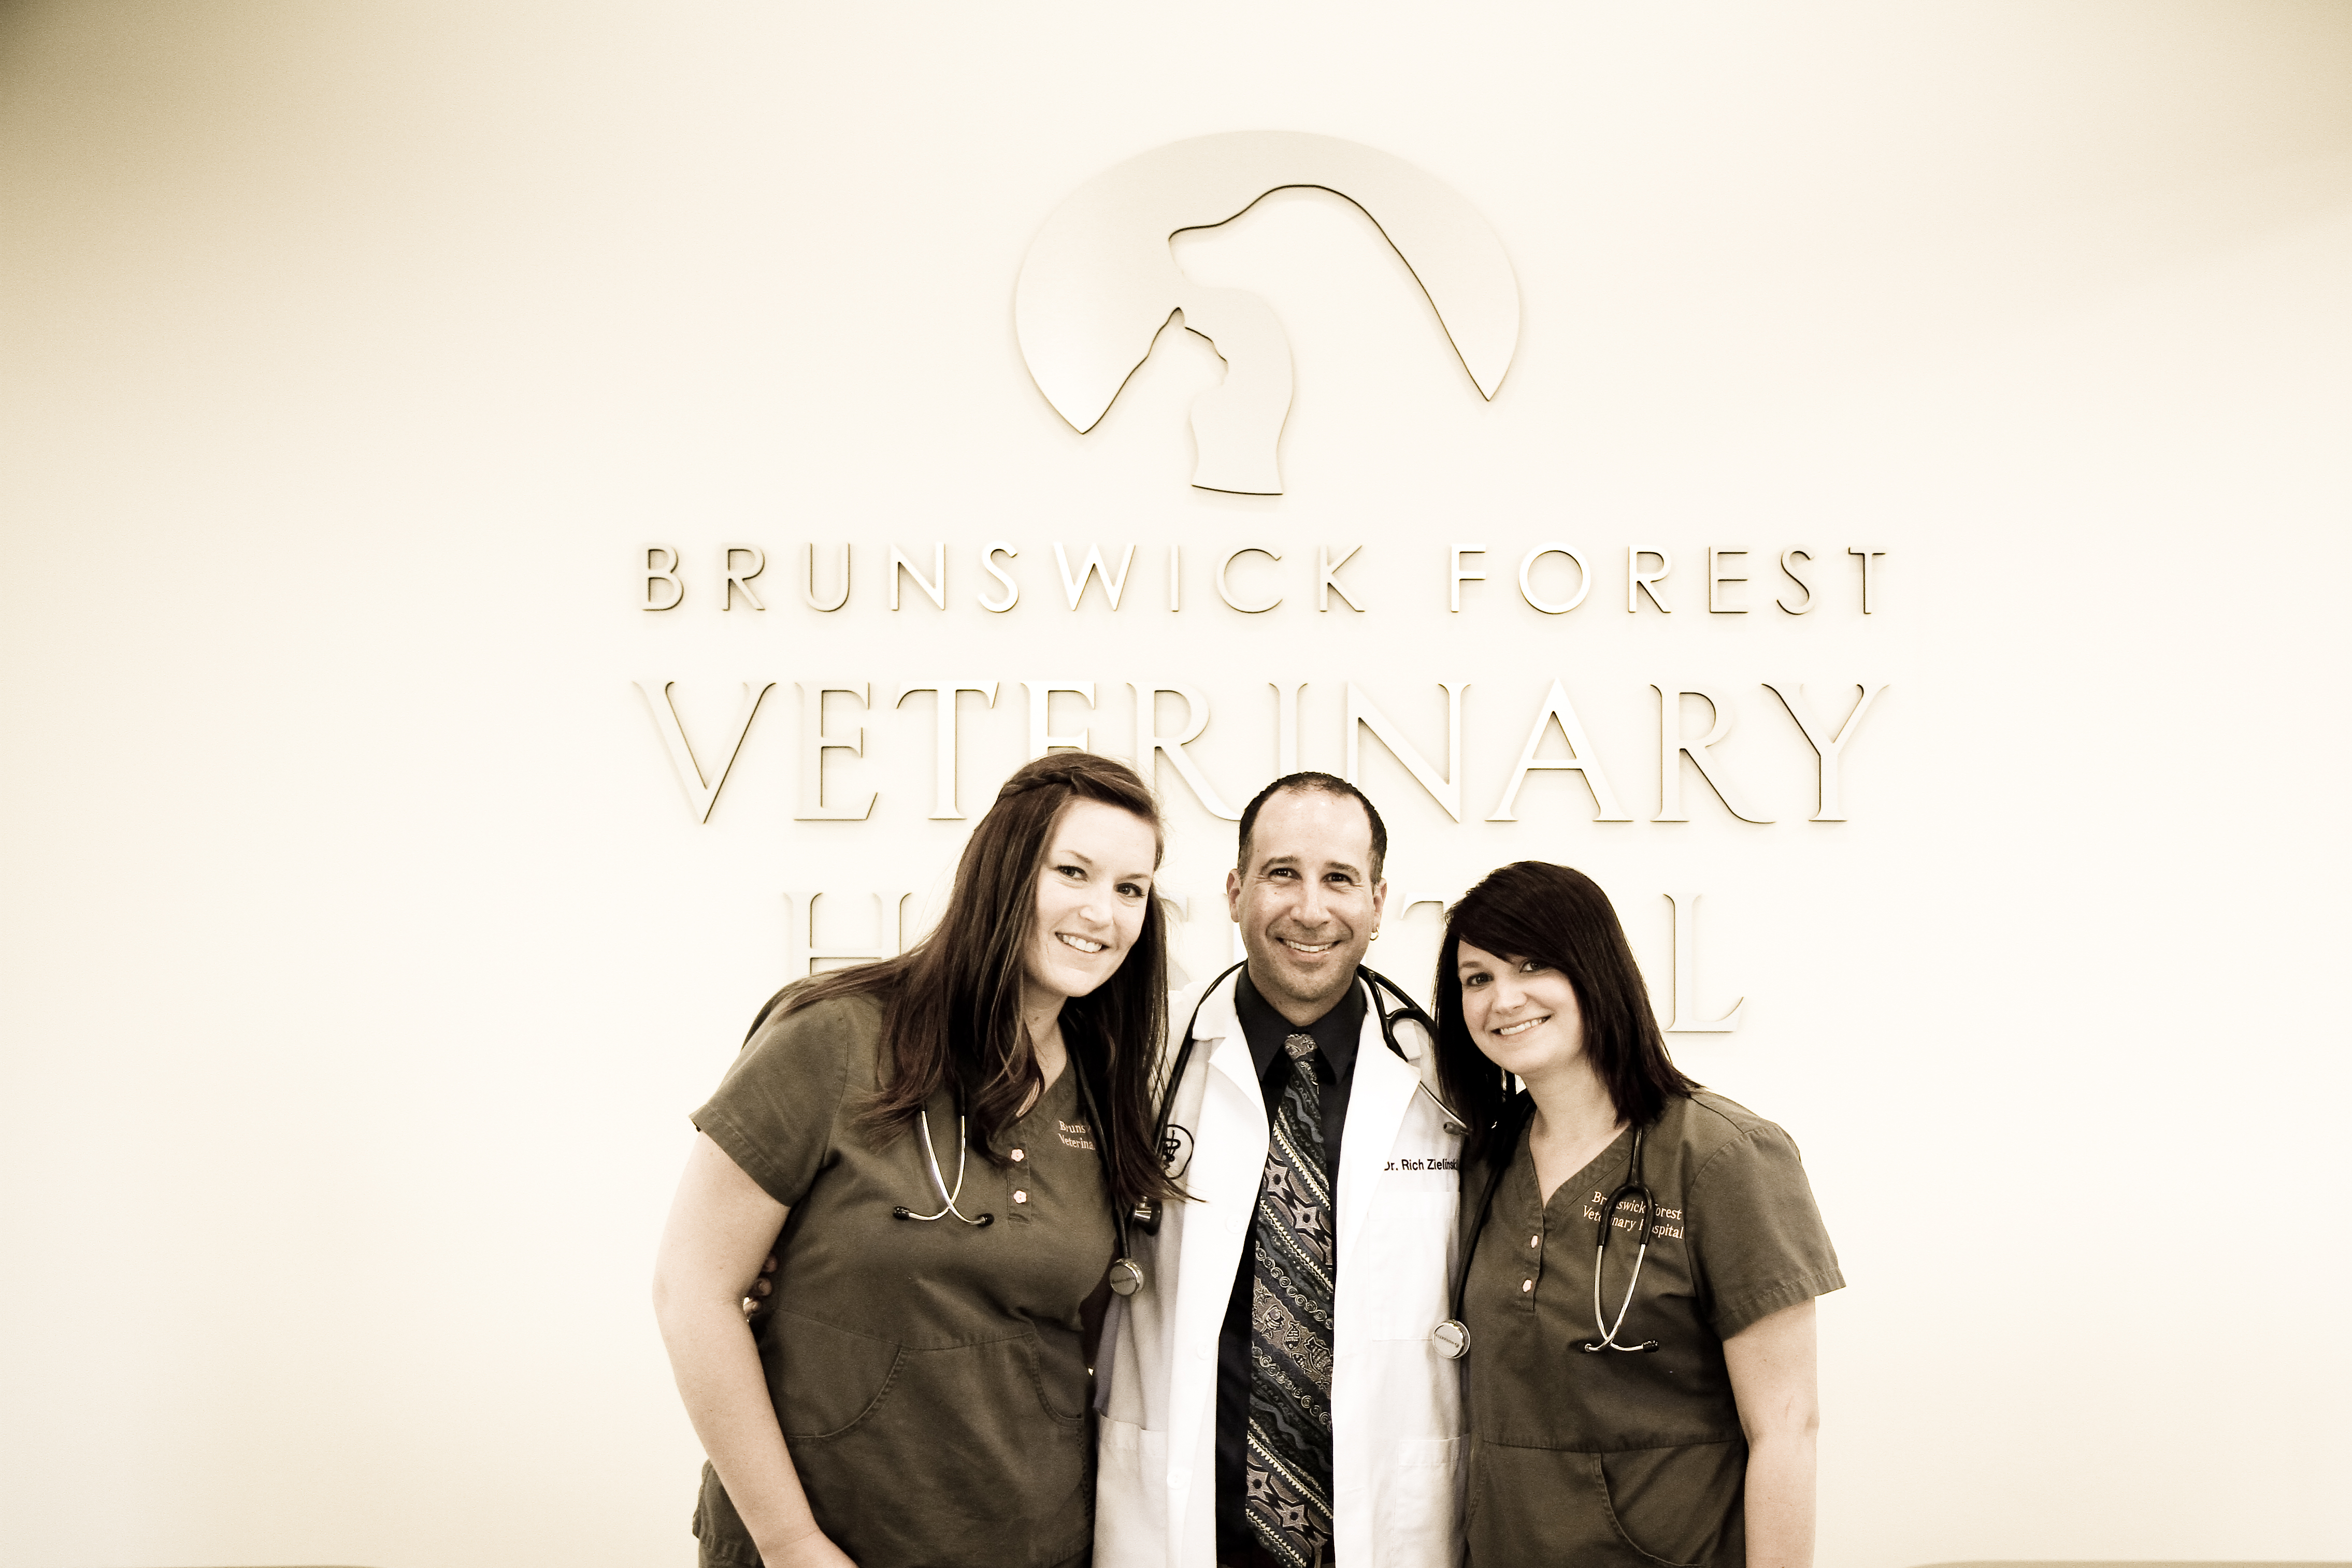 Brunswick Forest Veterinary Hospital